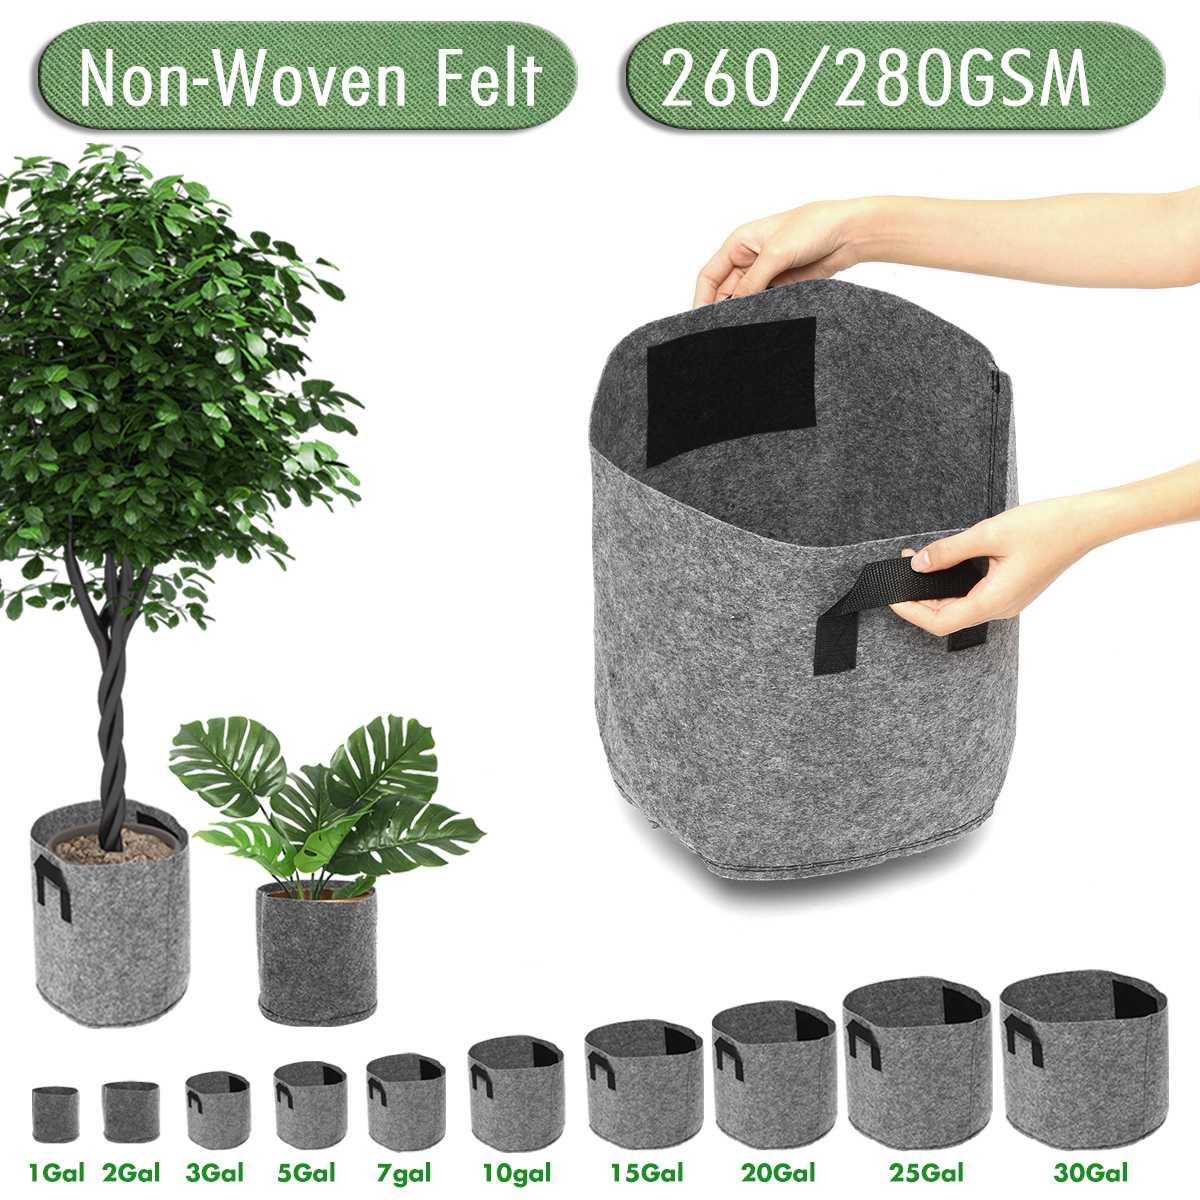 Non-Woven Felt 1-30 Gallon Fabric Grow Bags Breathable Pots Planter Root Pouch Container Plant Smart Pots With Handles Garden Su